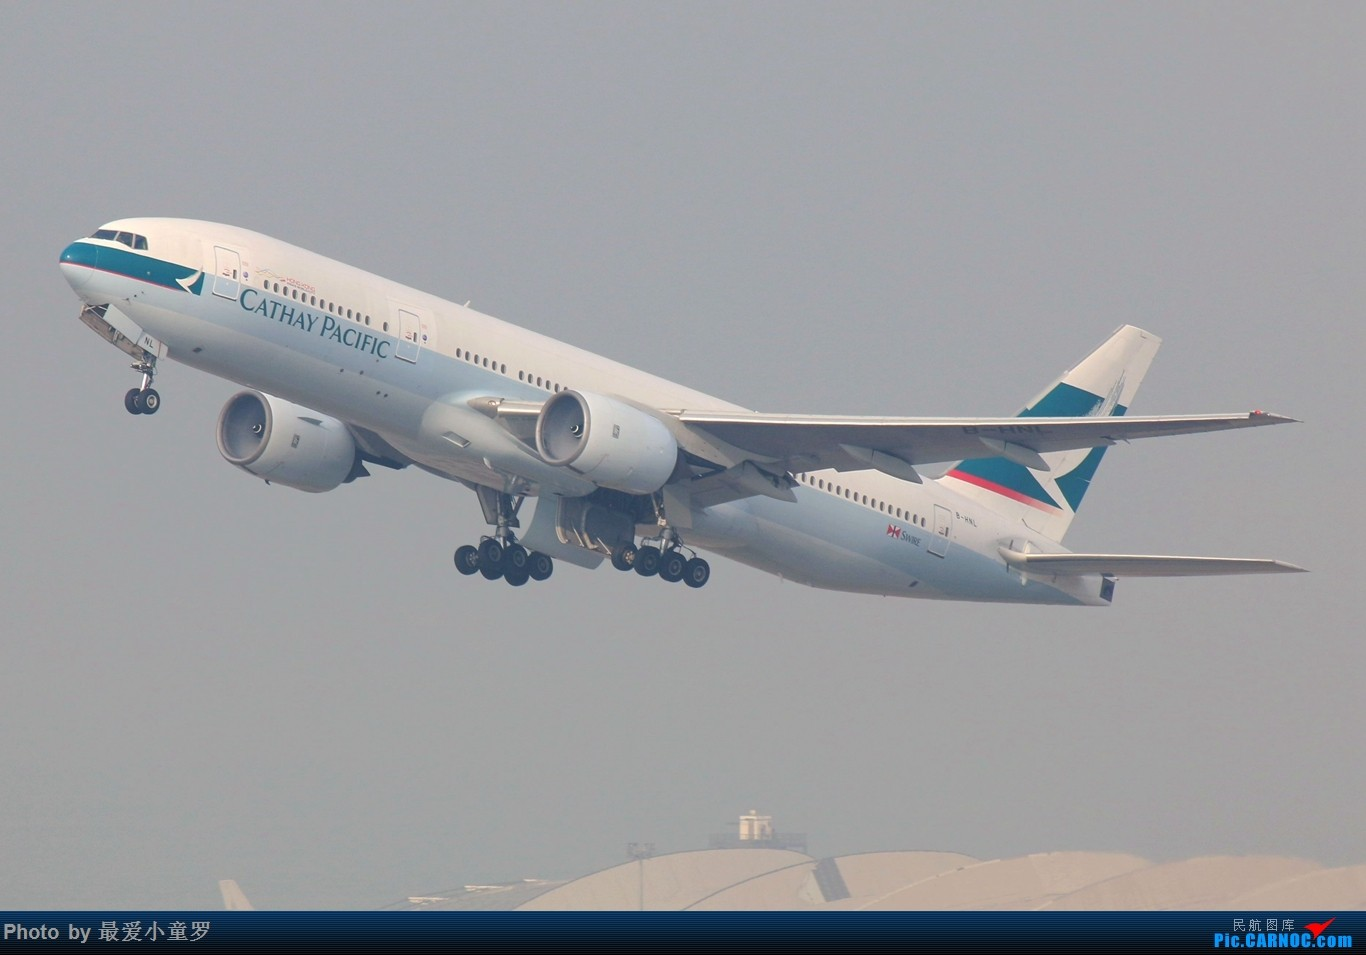 Re:[原创]2015年1月25日香港沙螺湾烂天拍机第二集——波音777 BOEING 777-200 B-HNL 中国香港赤鱲角国际机场